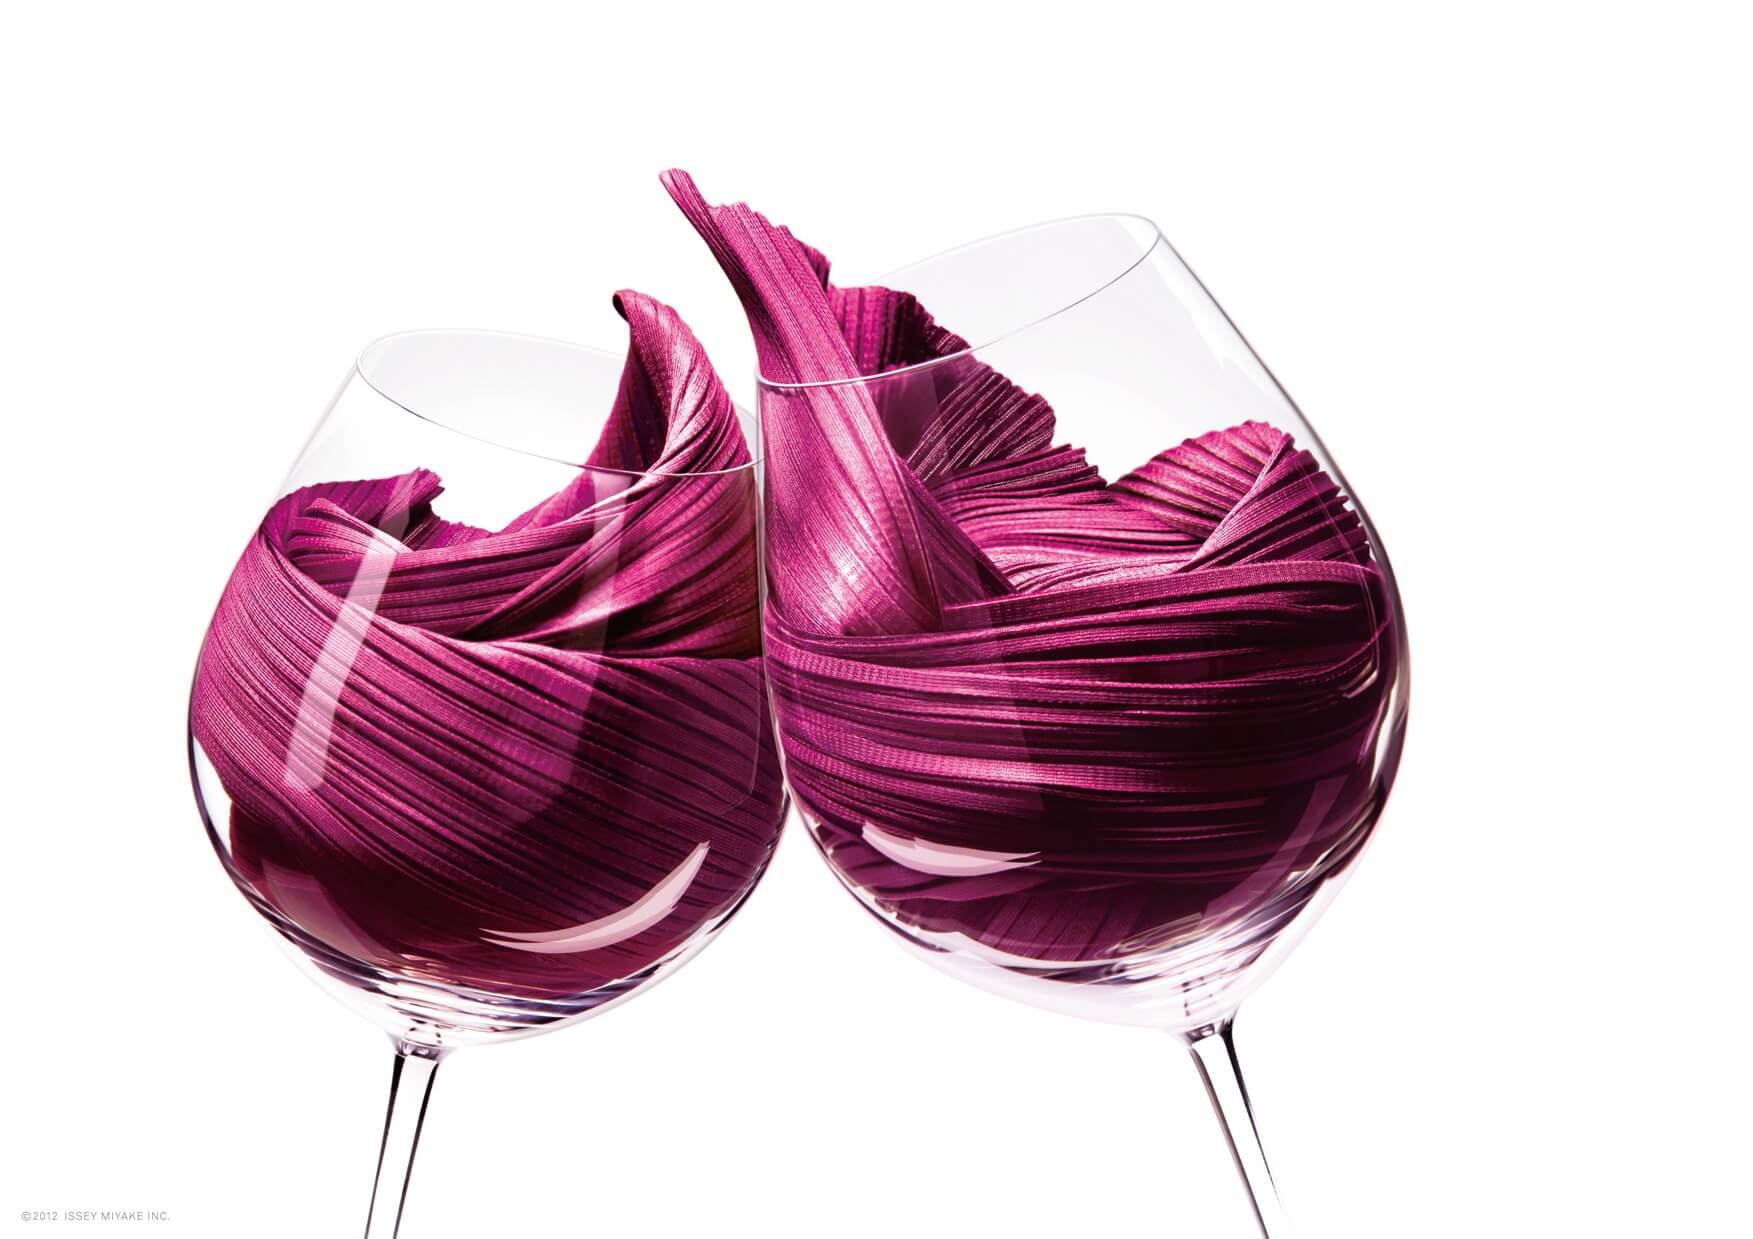 Минсельхоз готовит закон, разрешающий показ рекламы вина на телевидении